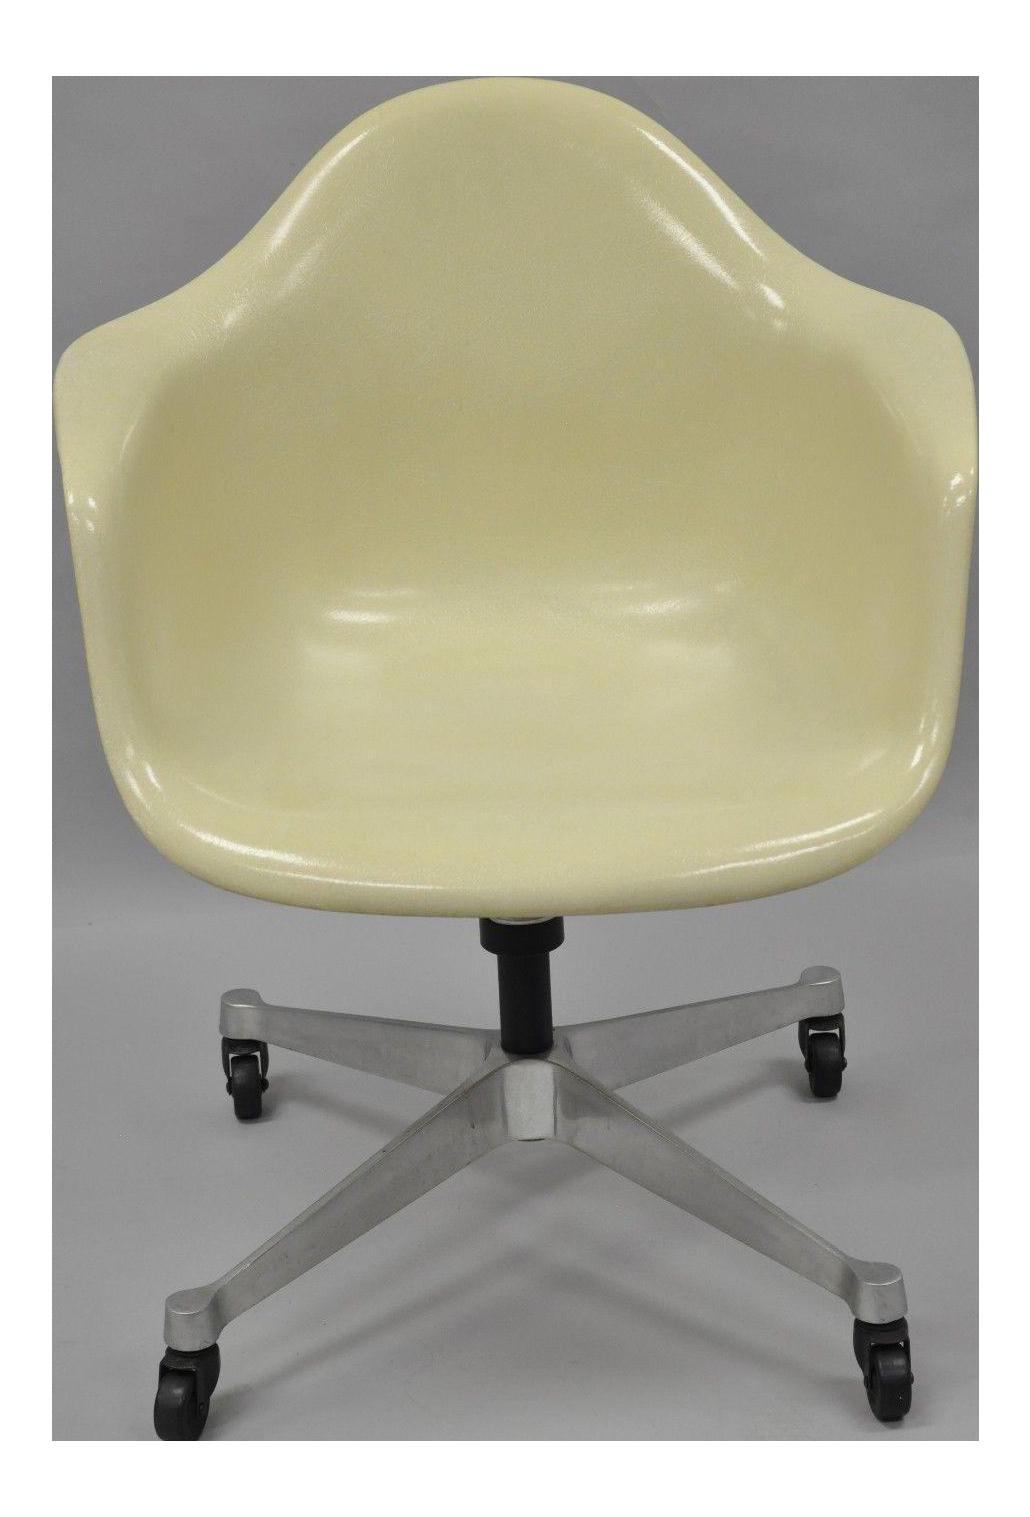 Vintage Herman Miller Eames Fiberglass Shell Pearl Beige Rolling Desk  Office Chair | Chairish